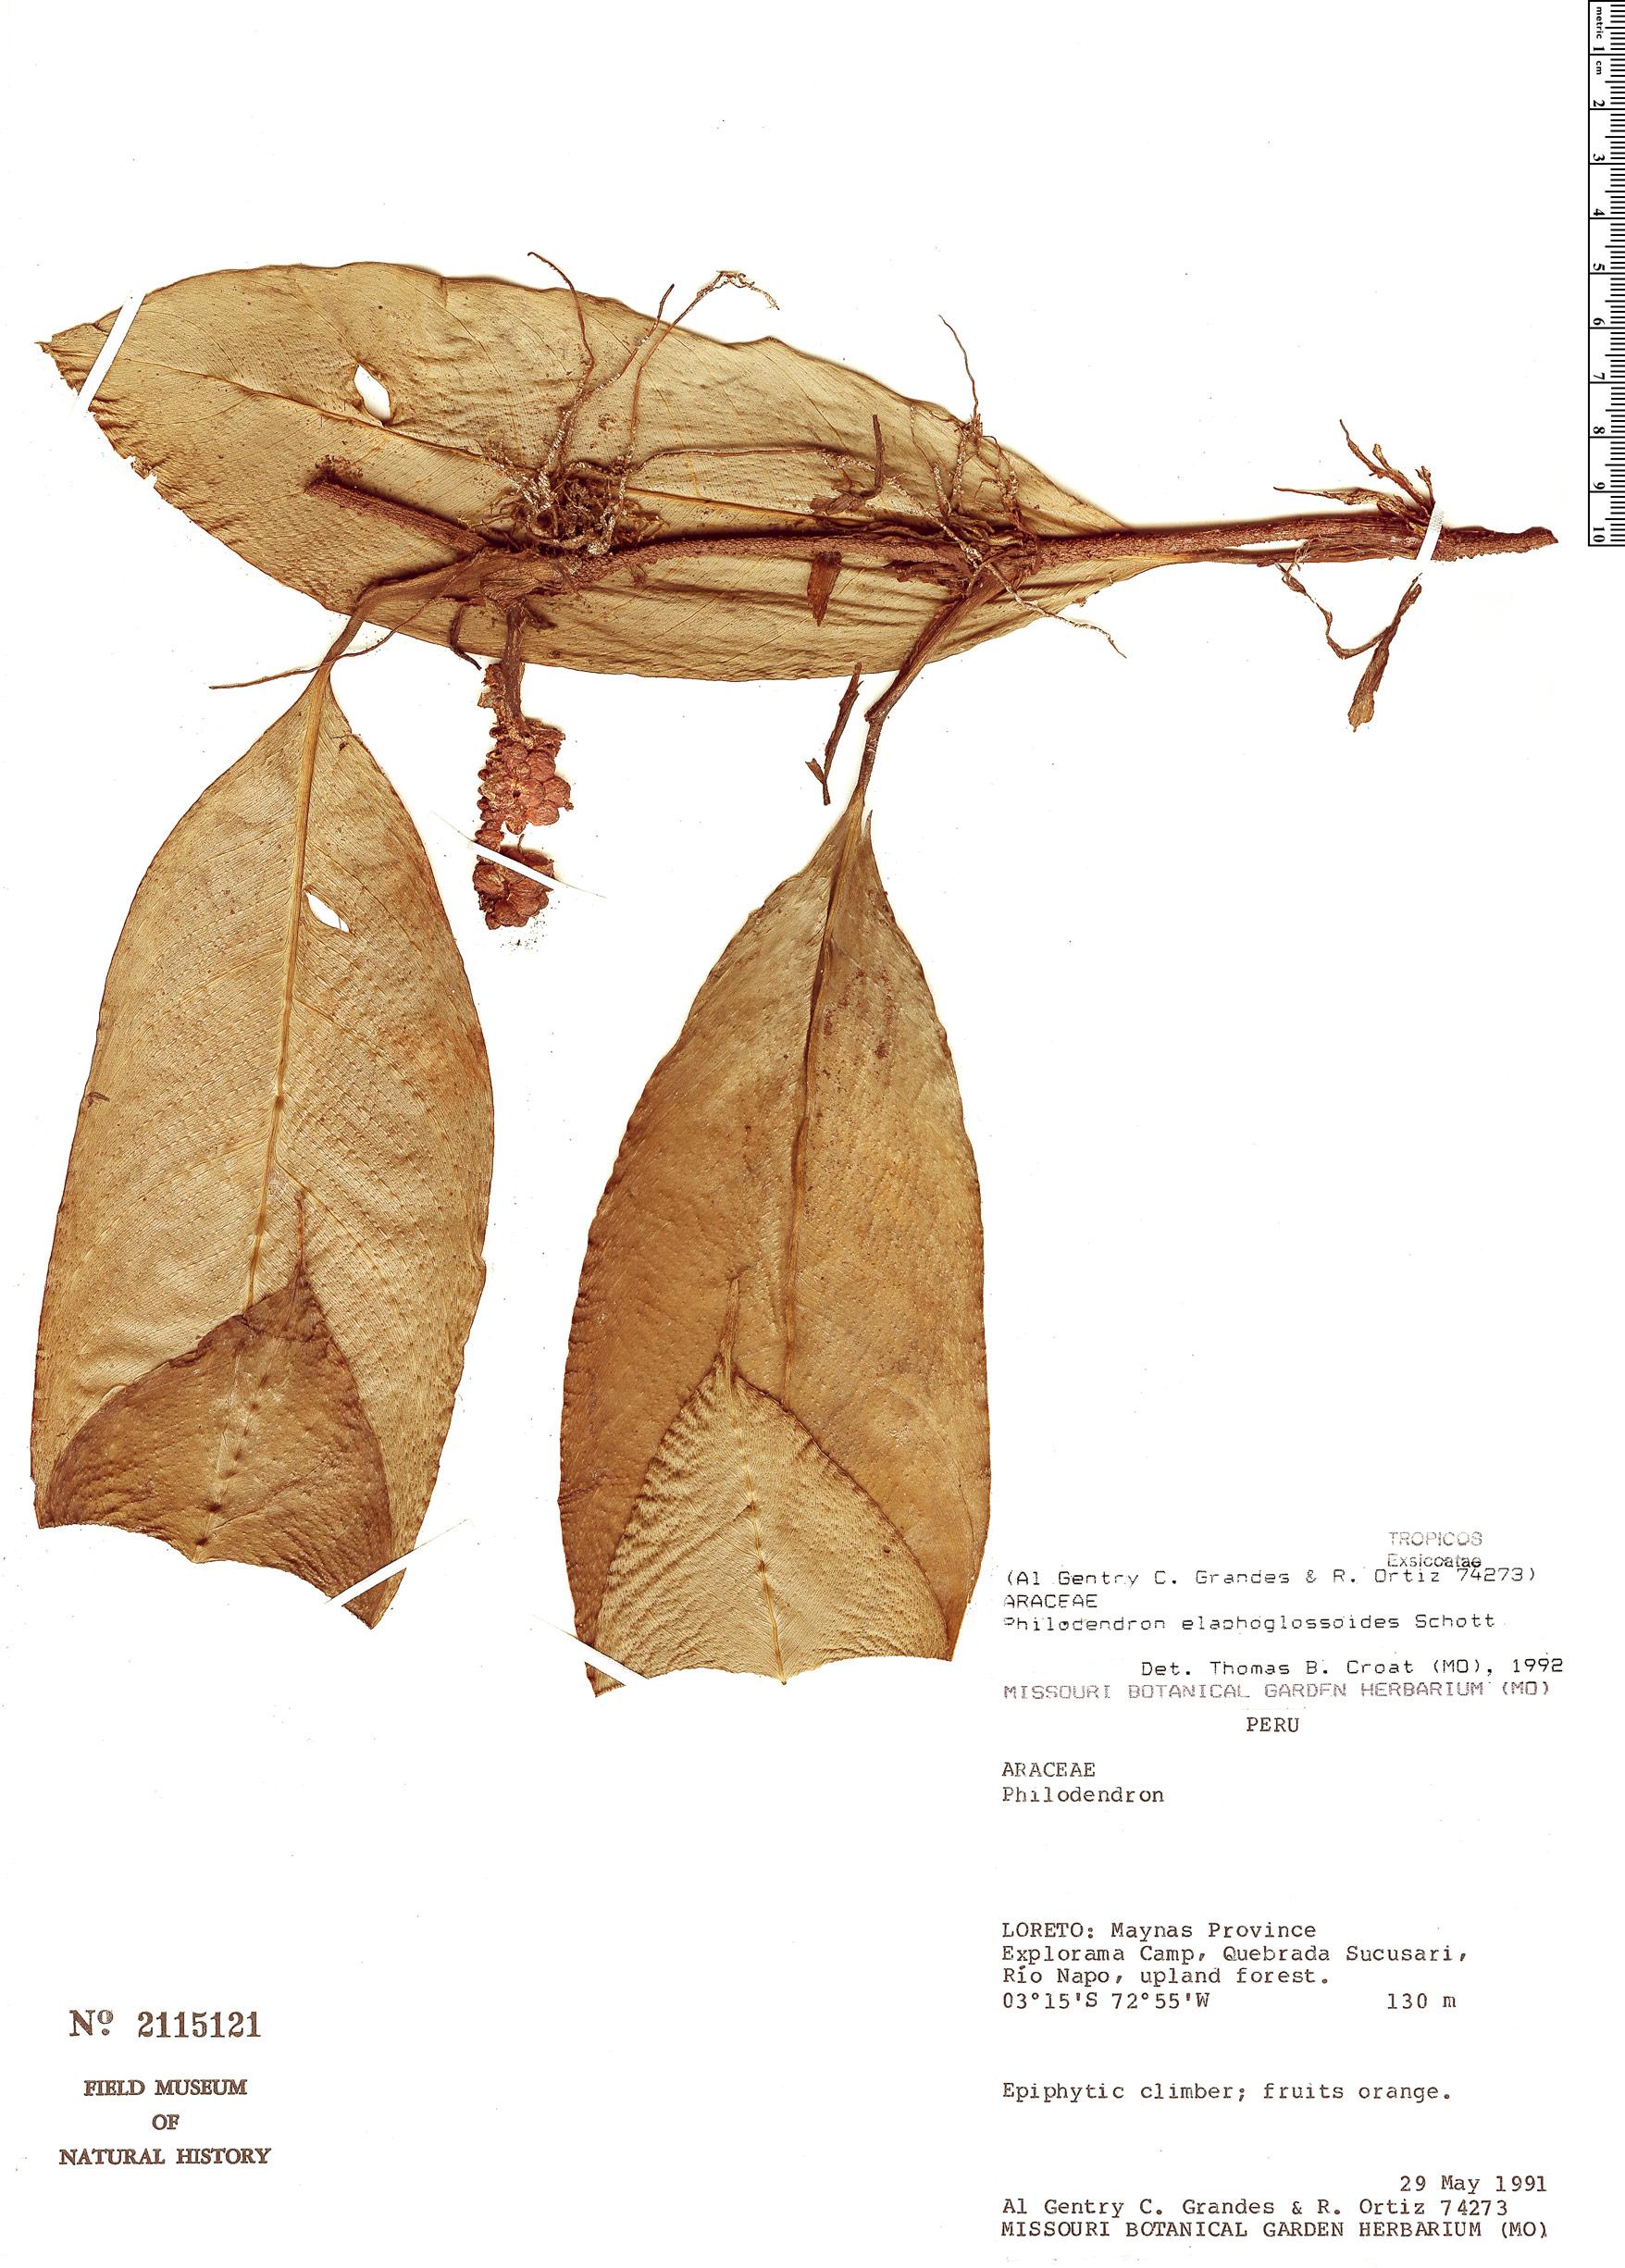 Specimen: Philodendron elaphoglossoides